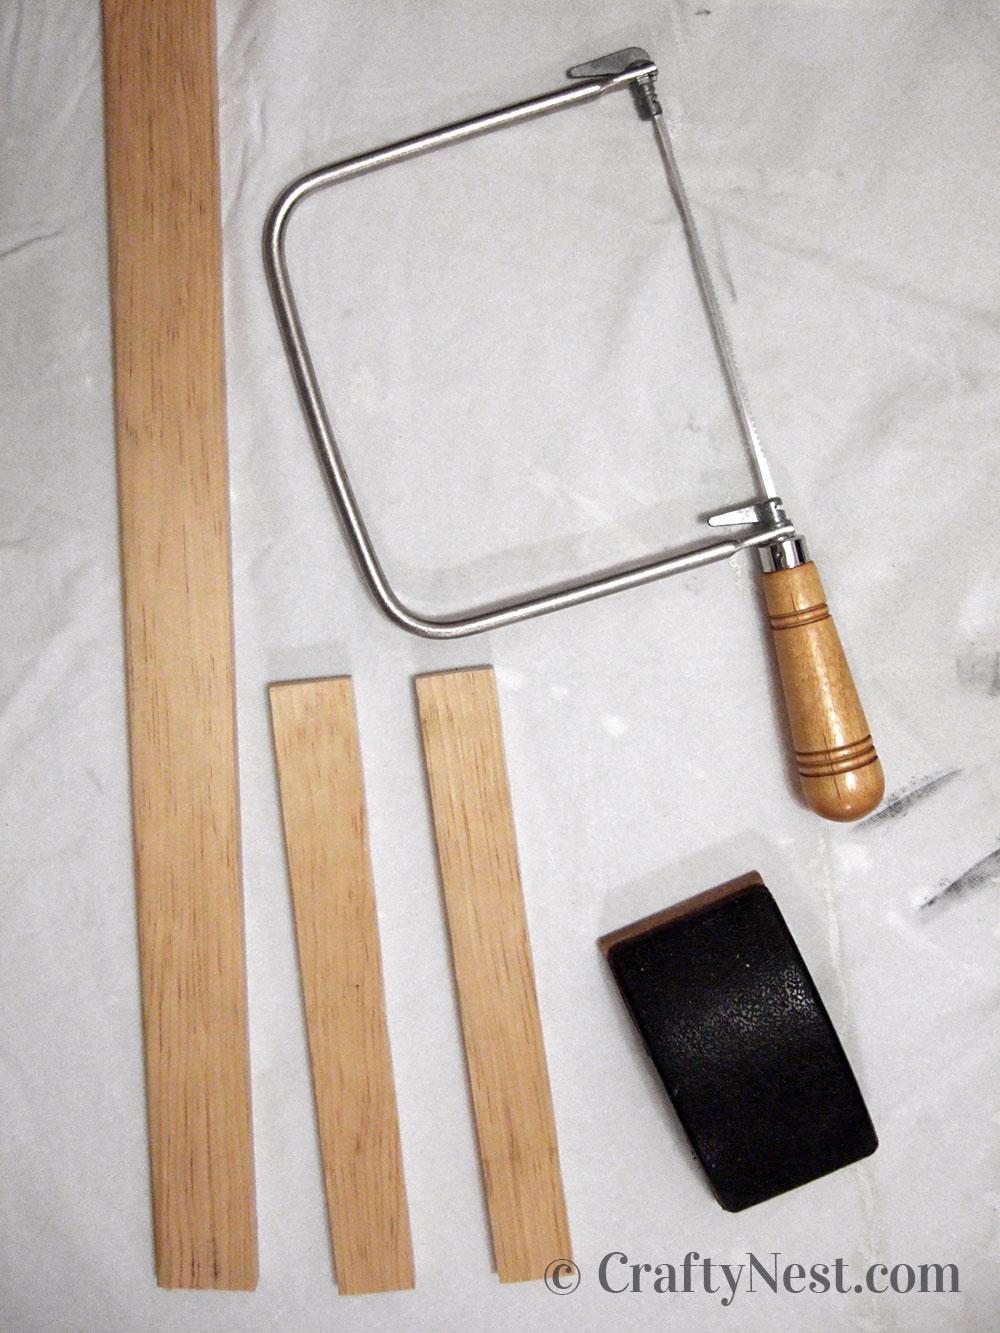 Cut piece of wood, photo